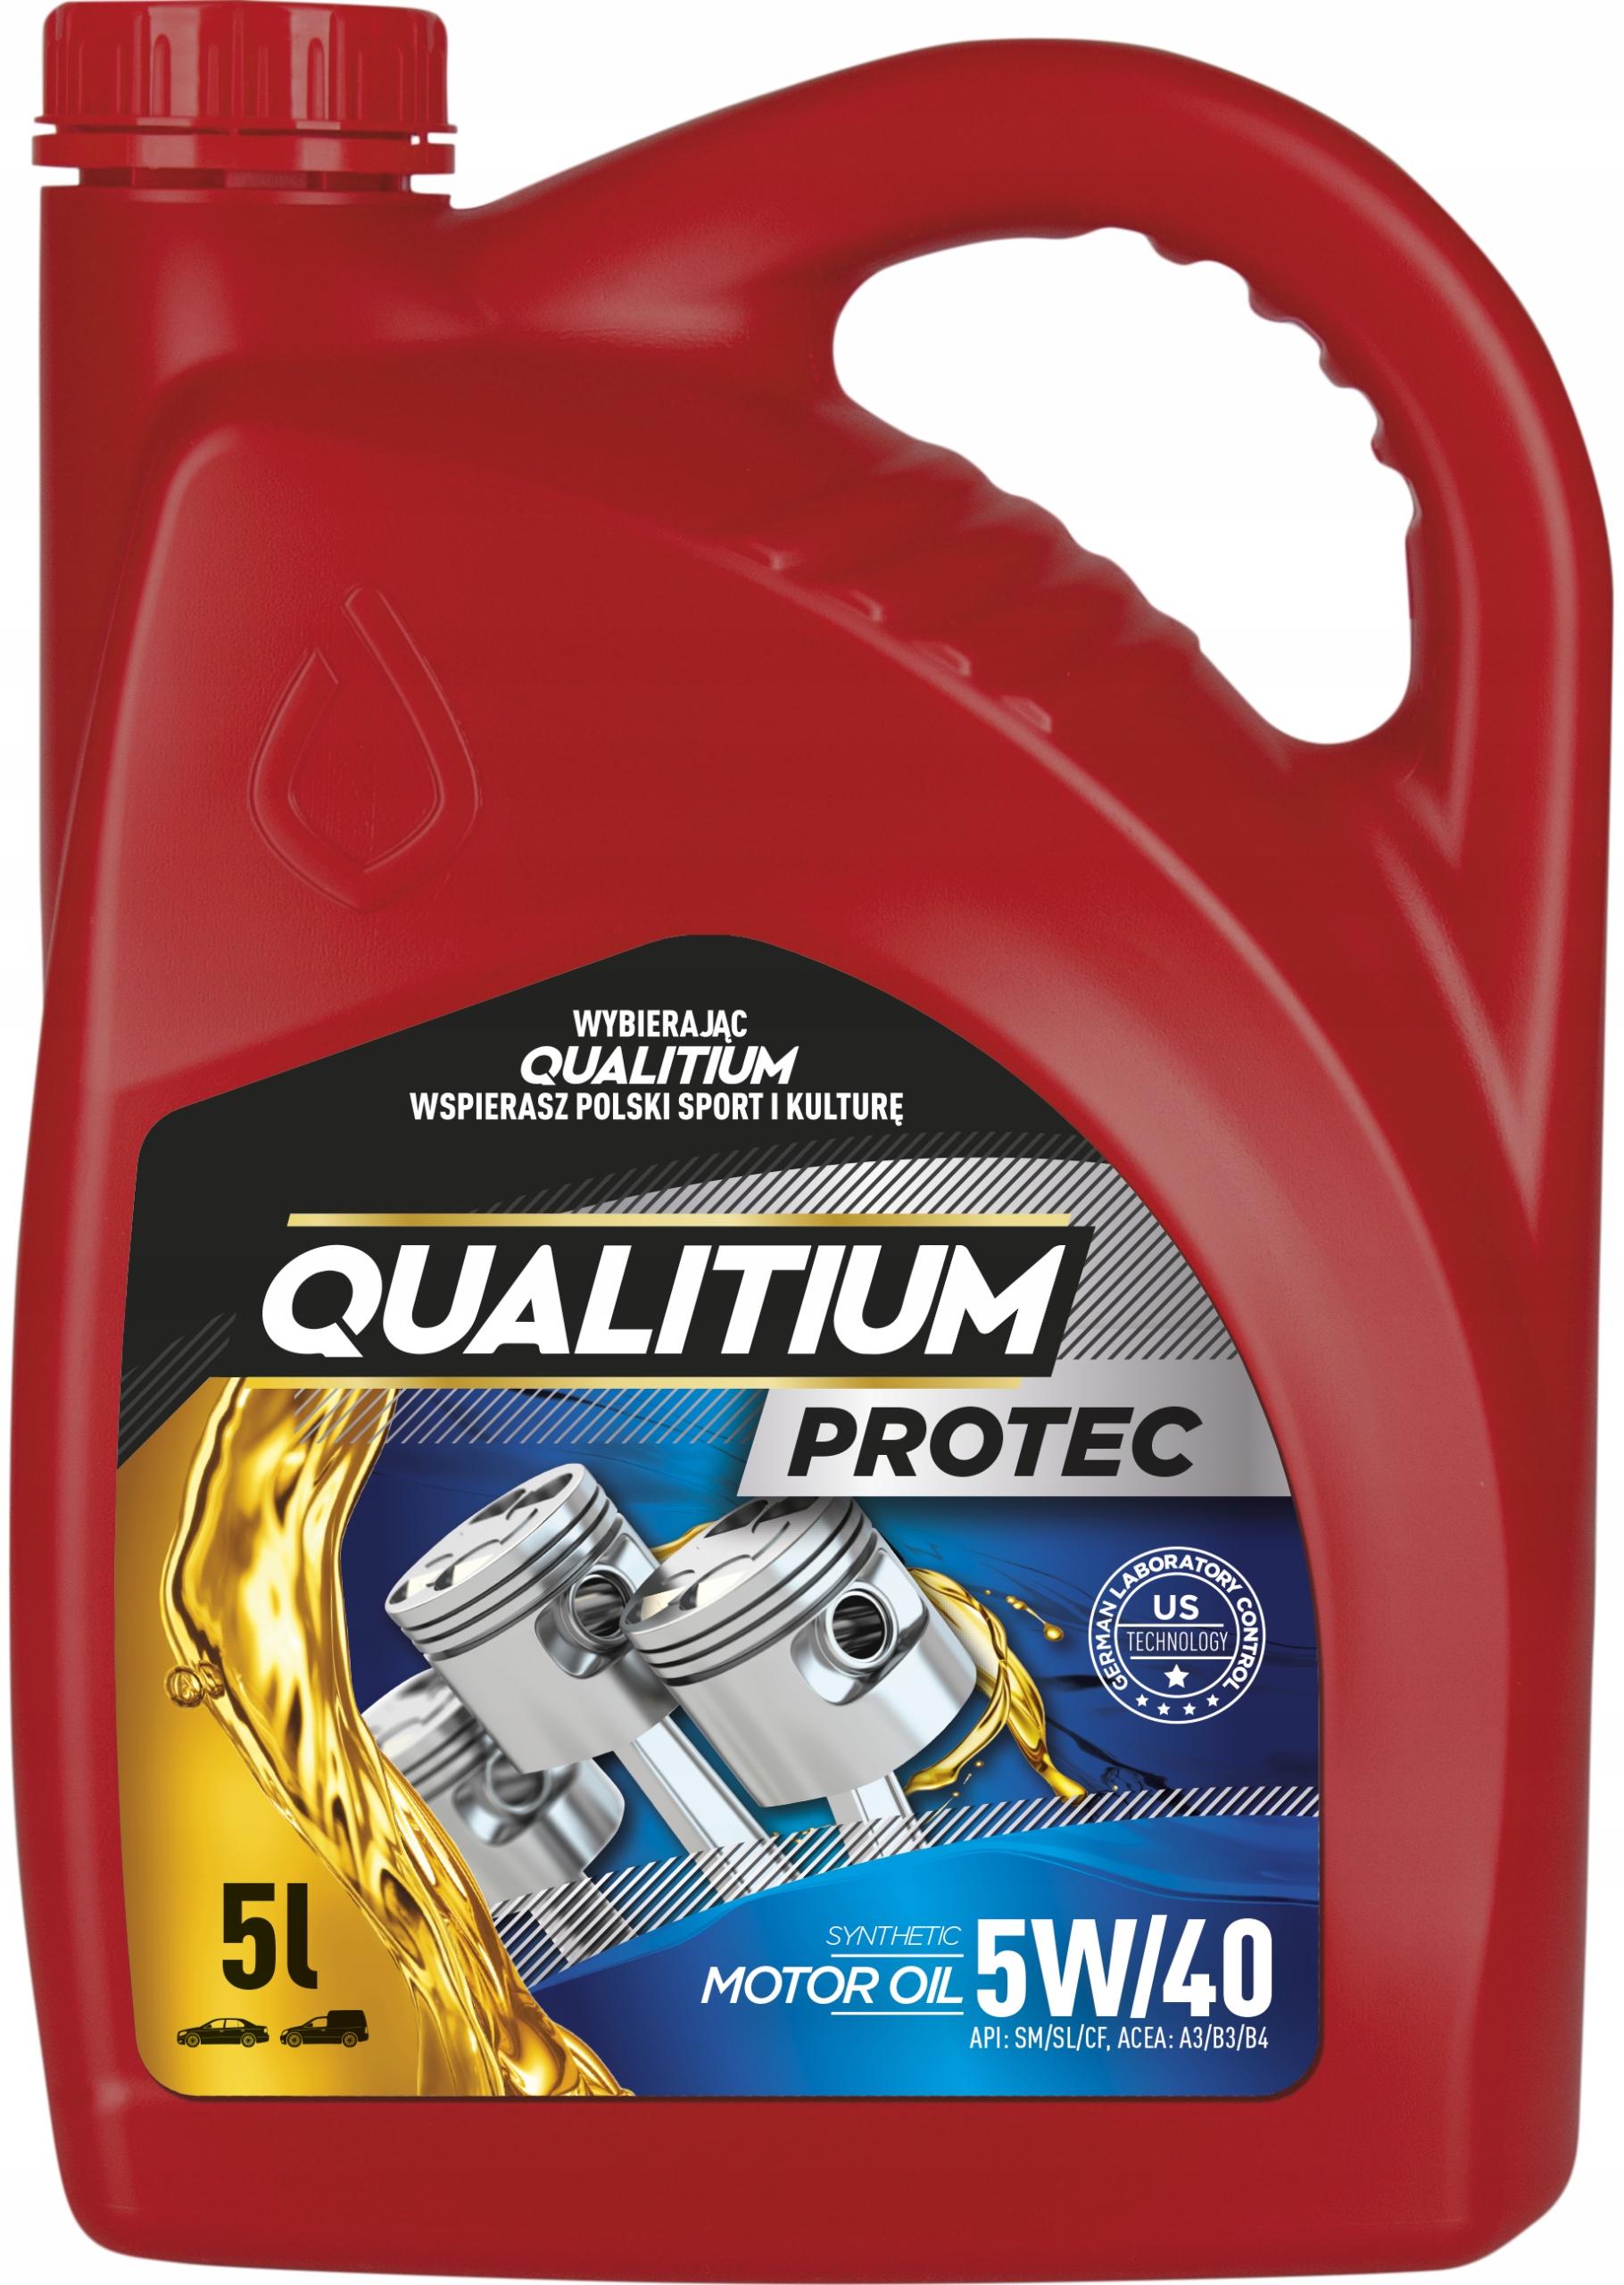 QUALITIUM PROTEC 5W40 5L Синтетическое масло